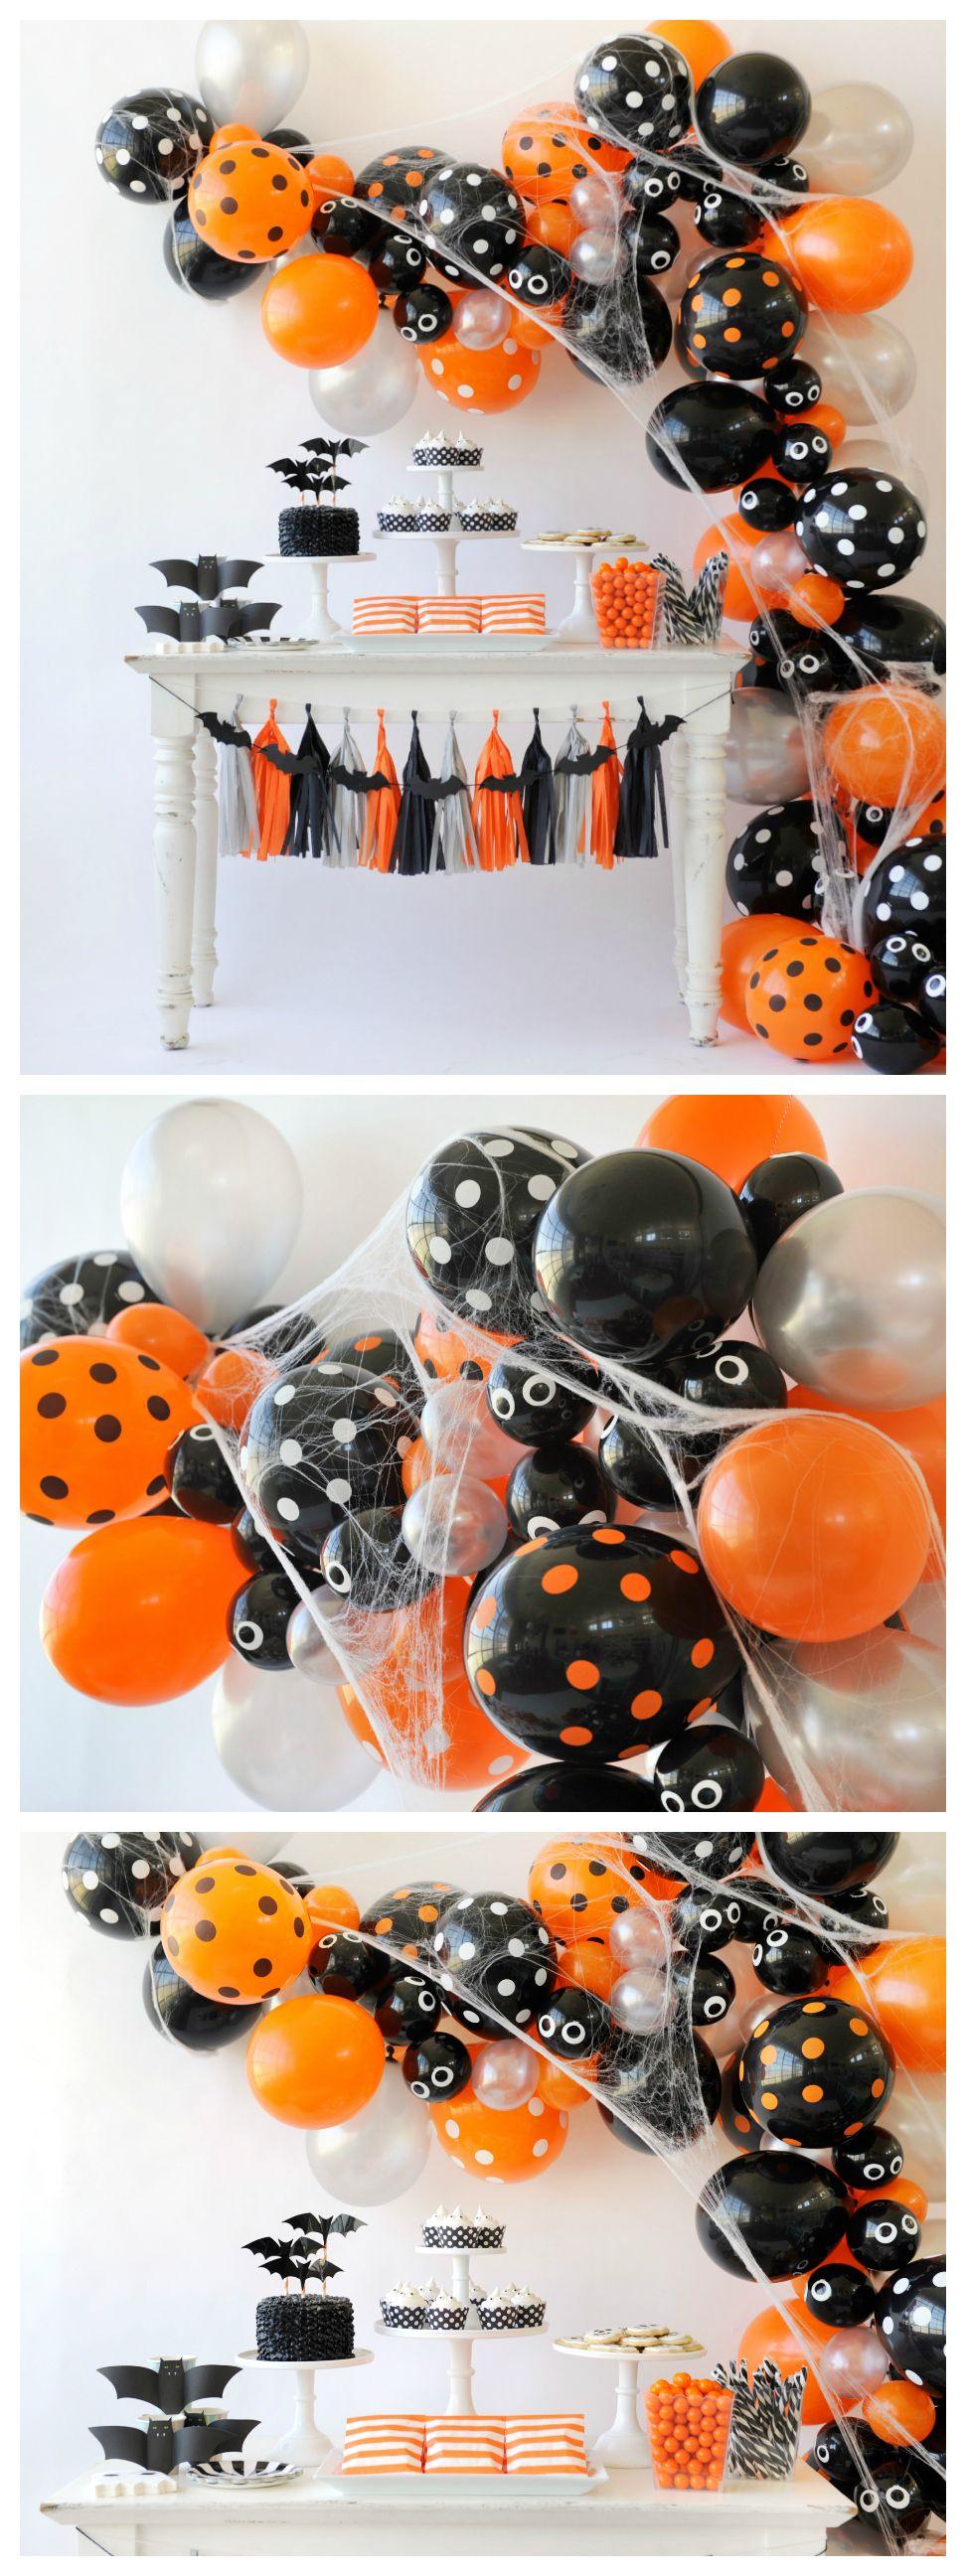 Spooky Halloween Balloon Garland | Halloween Party Decorations